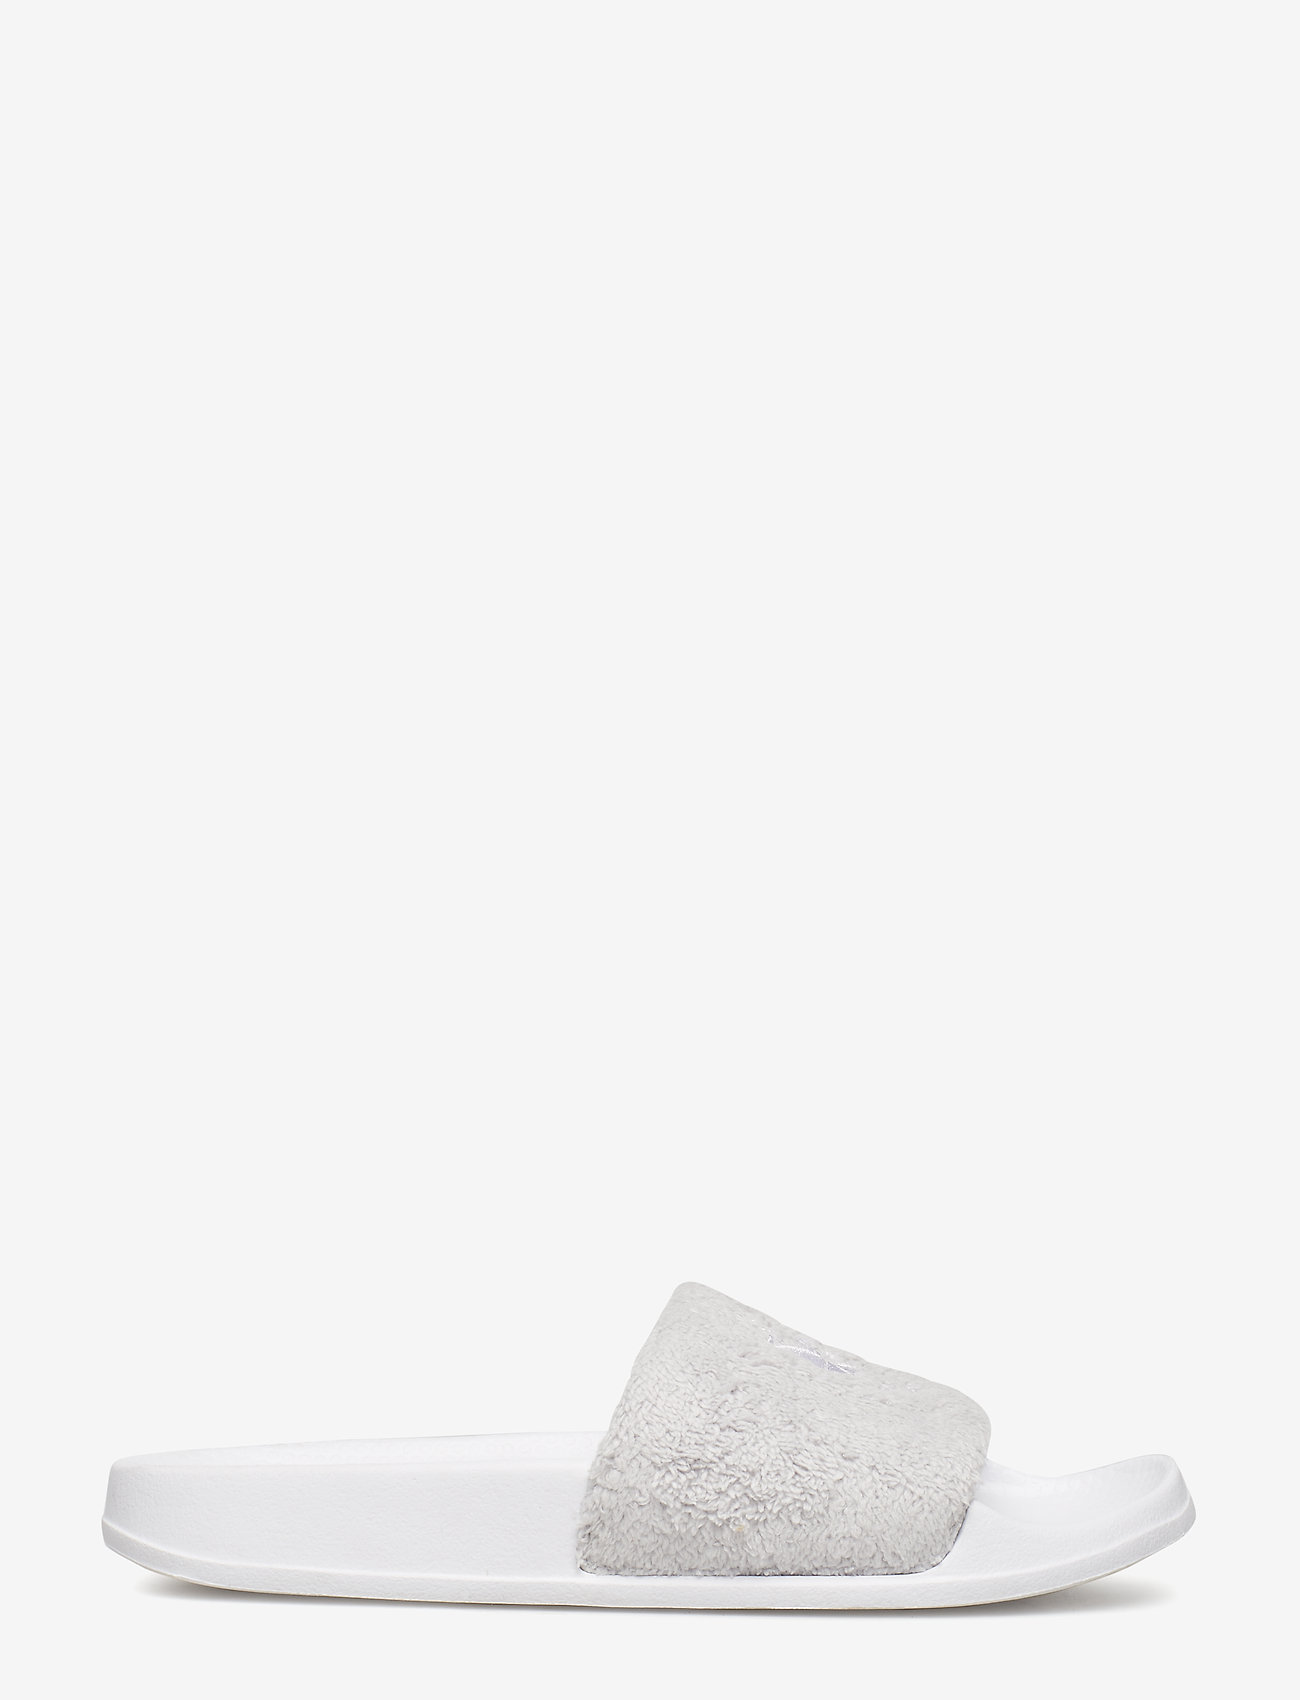 Reebok Classics - REEBOK CLASSIC SLIDE - pool sliders - white/lgh solid grey